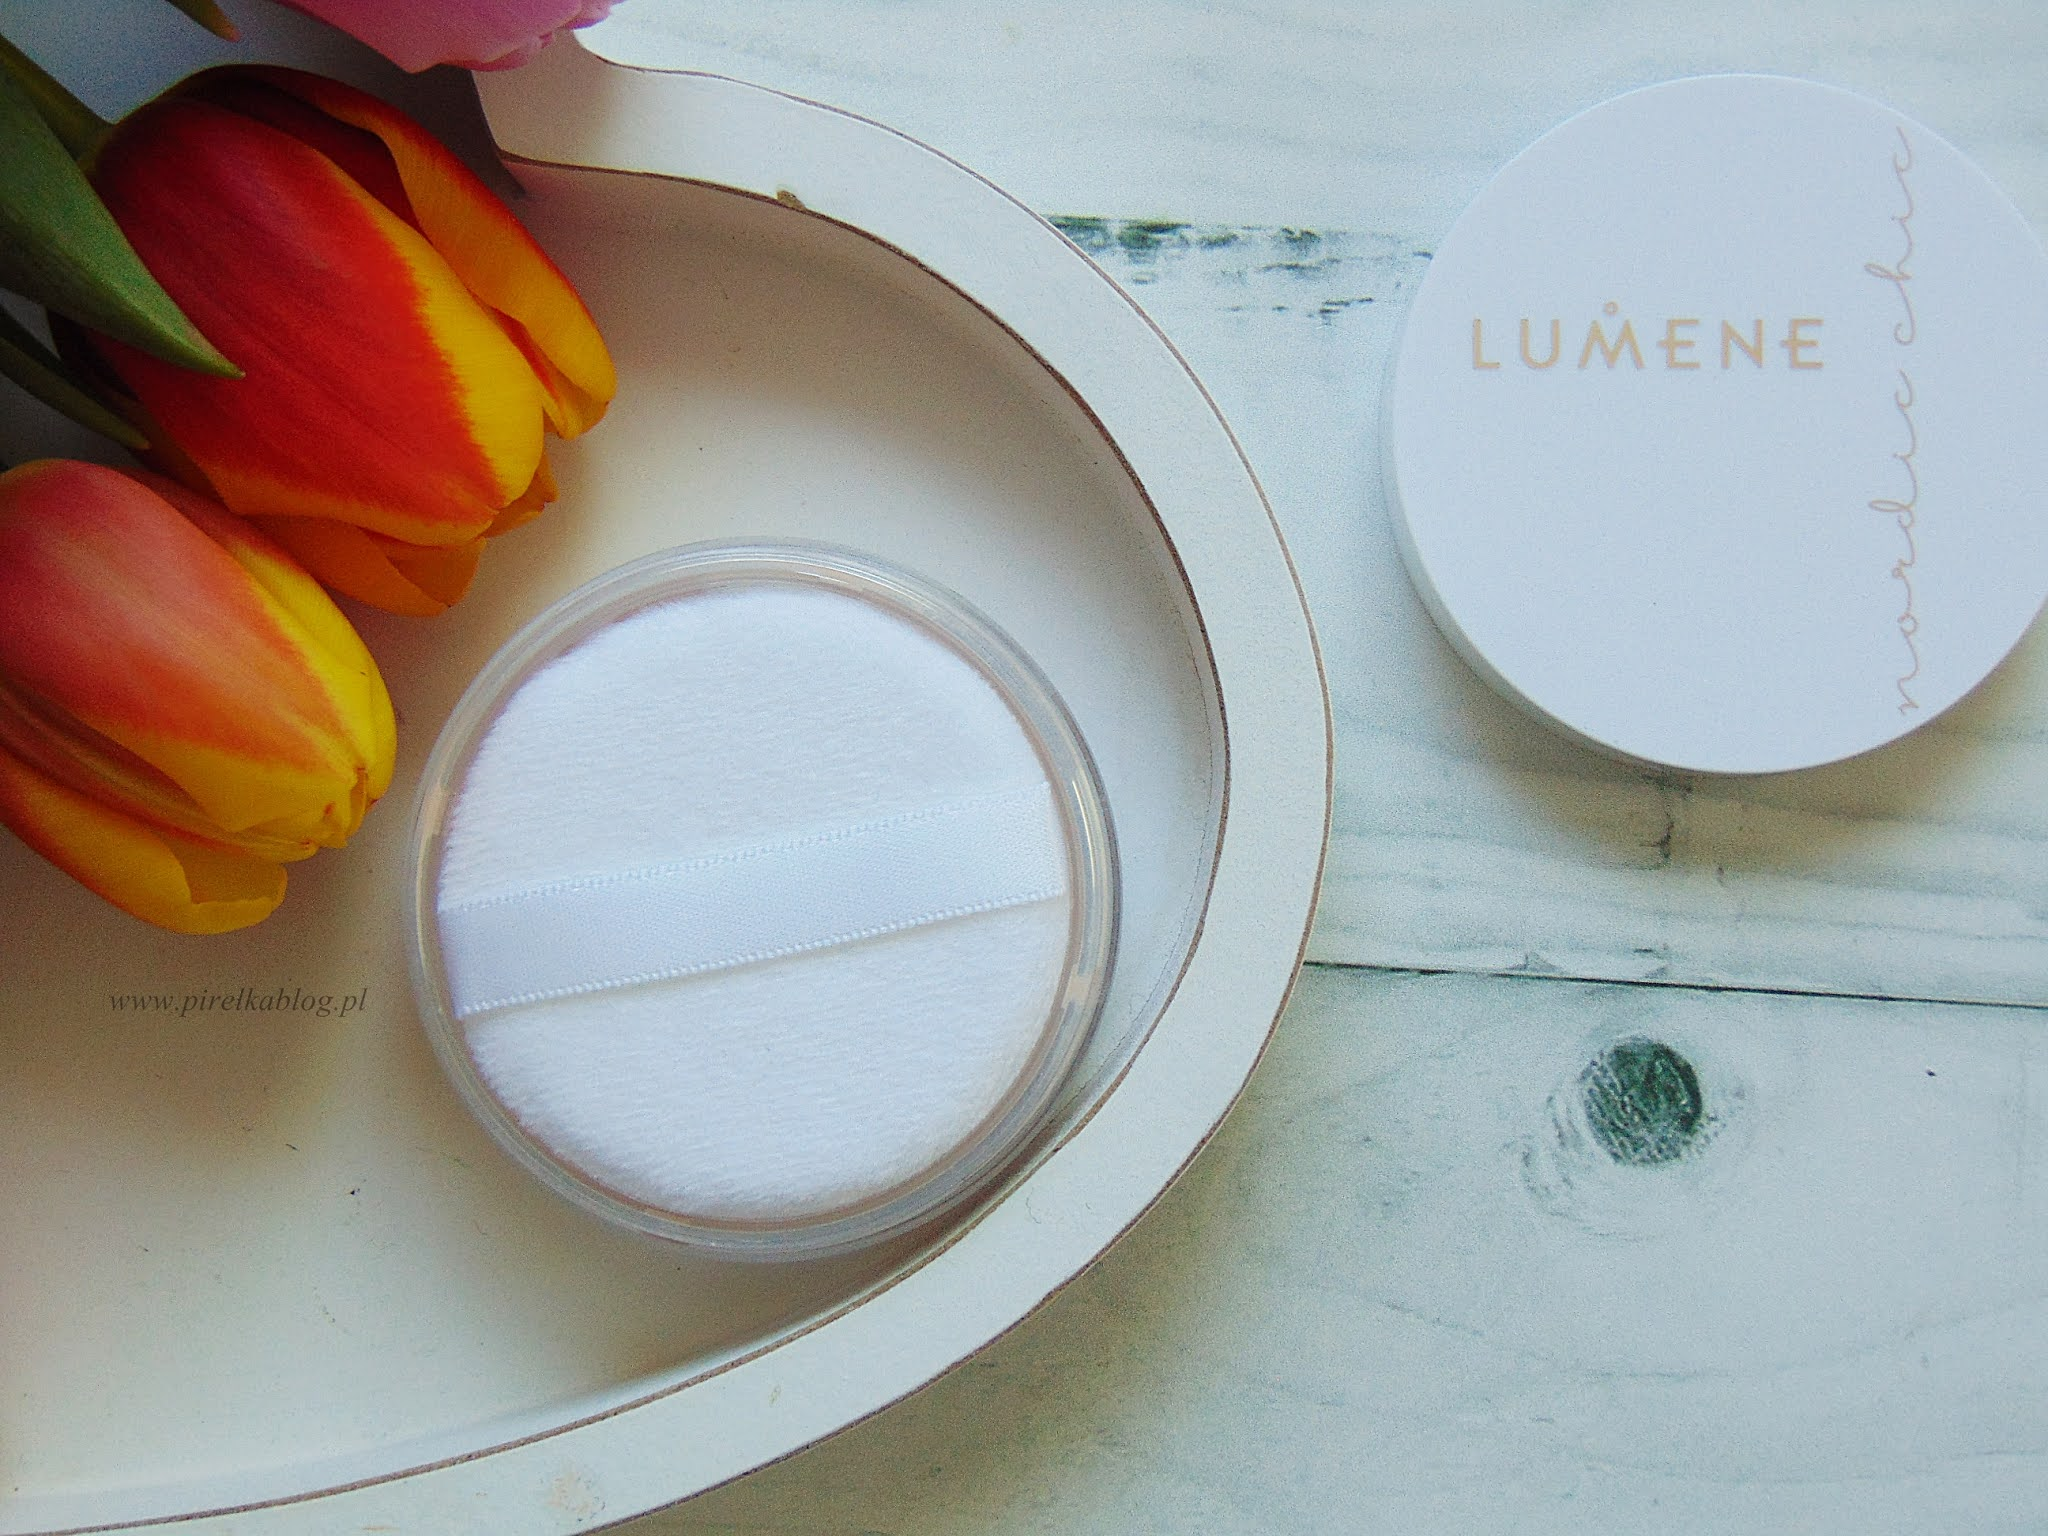 Lumene - Nordic Chic puder sypki transparentny